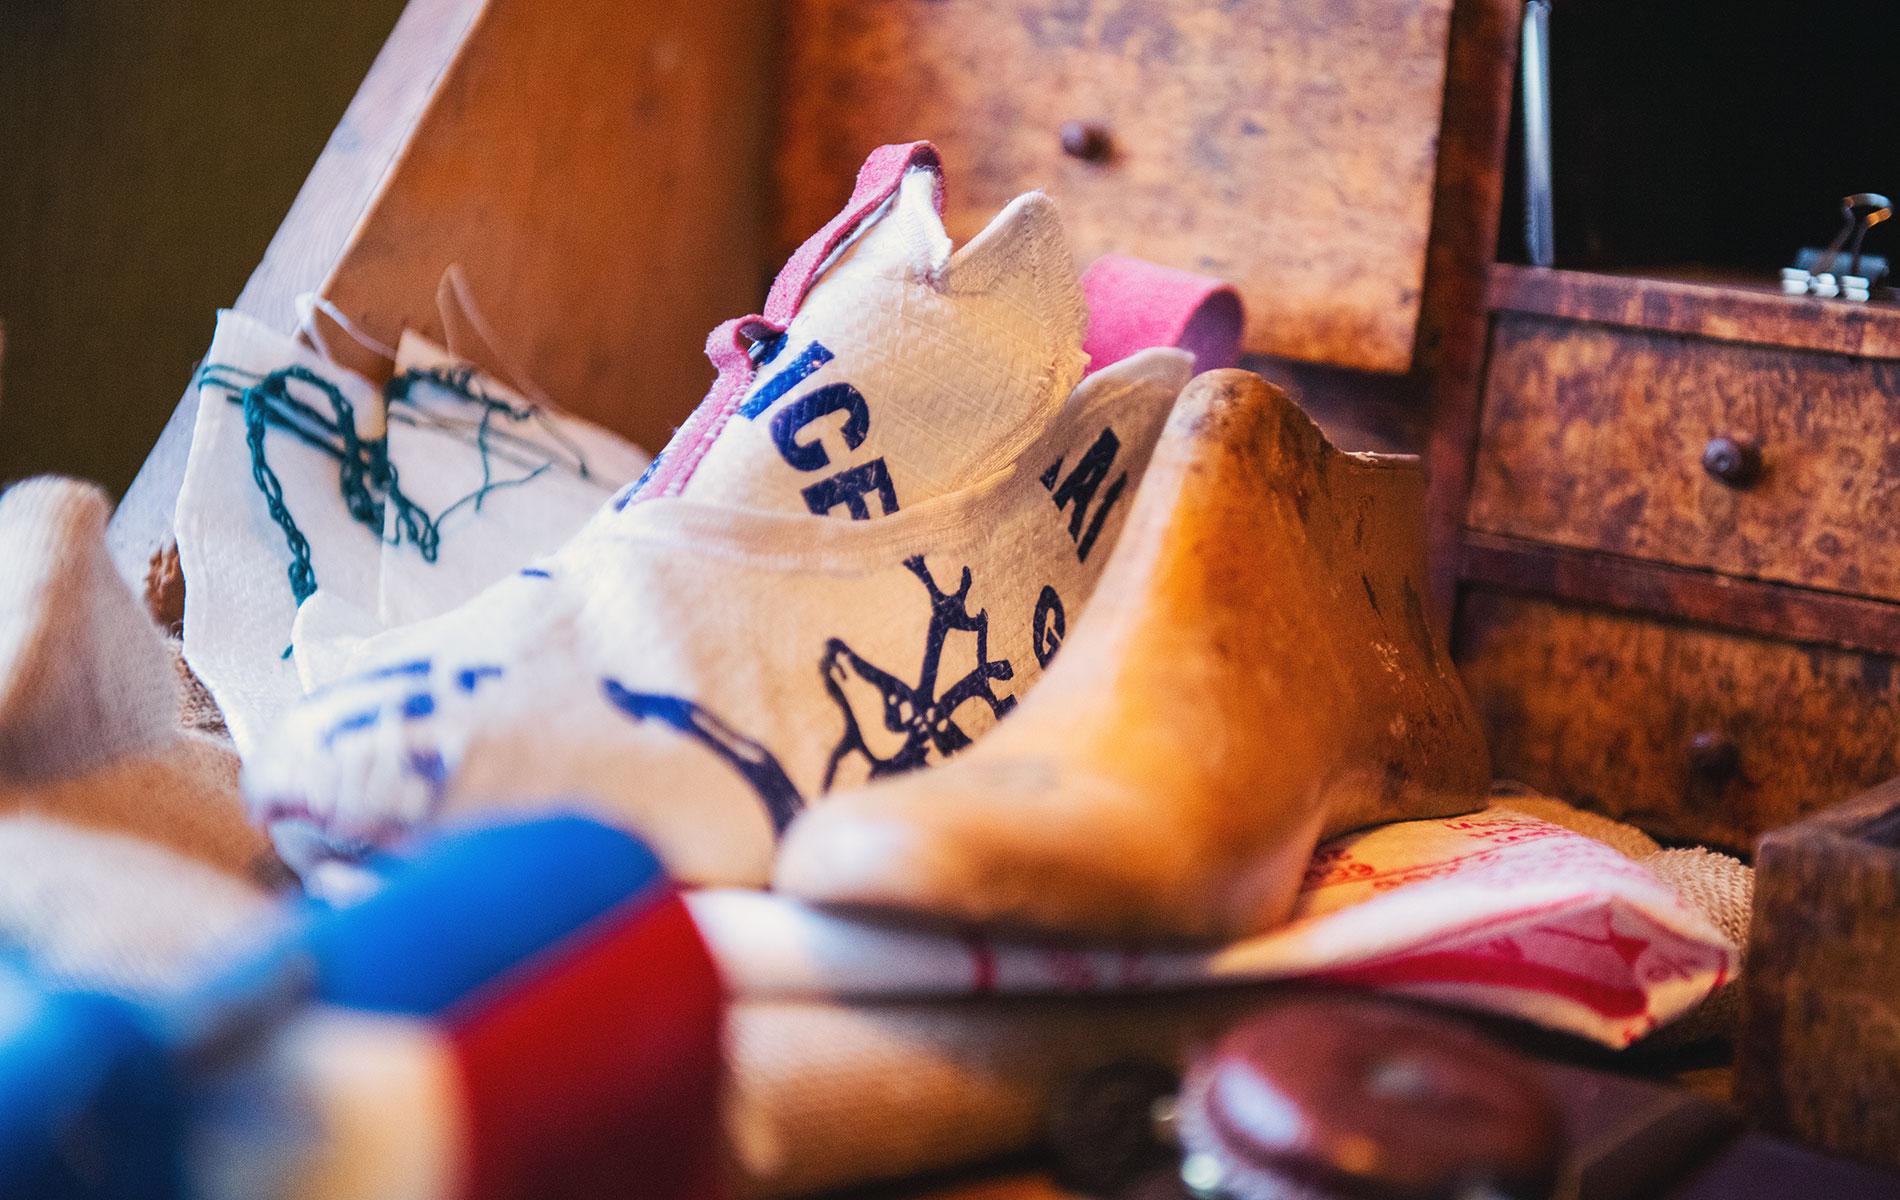 Buhay-developing-sustainabal_Shoes_228_2019.jpg